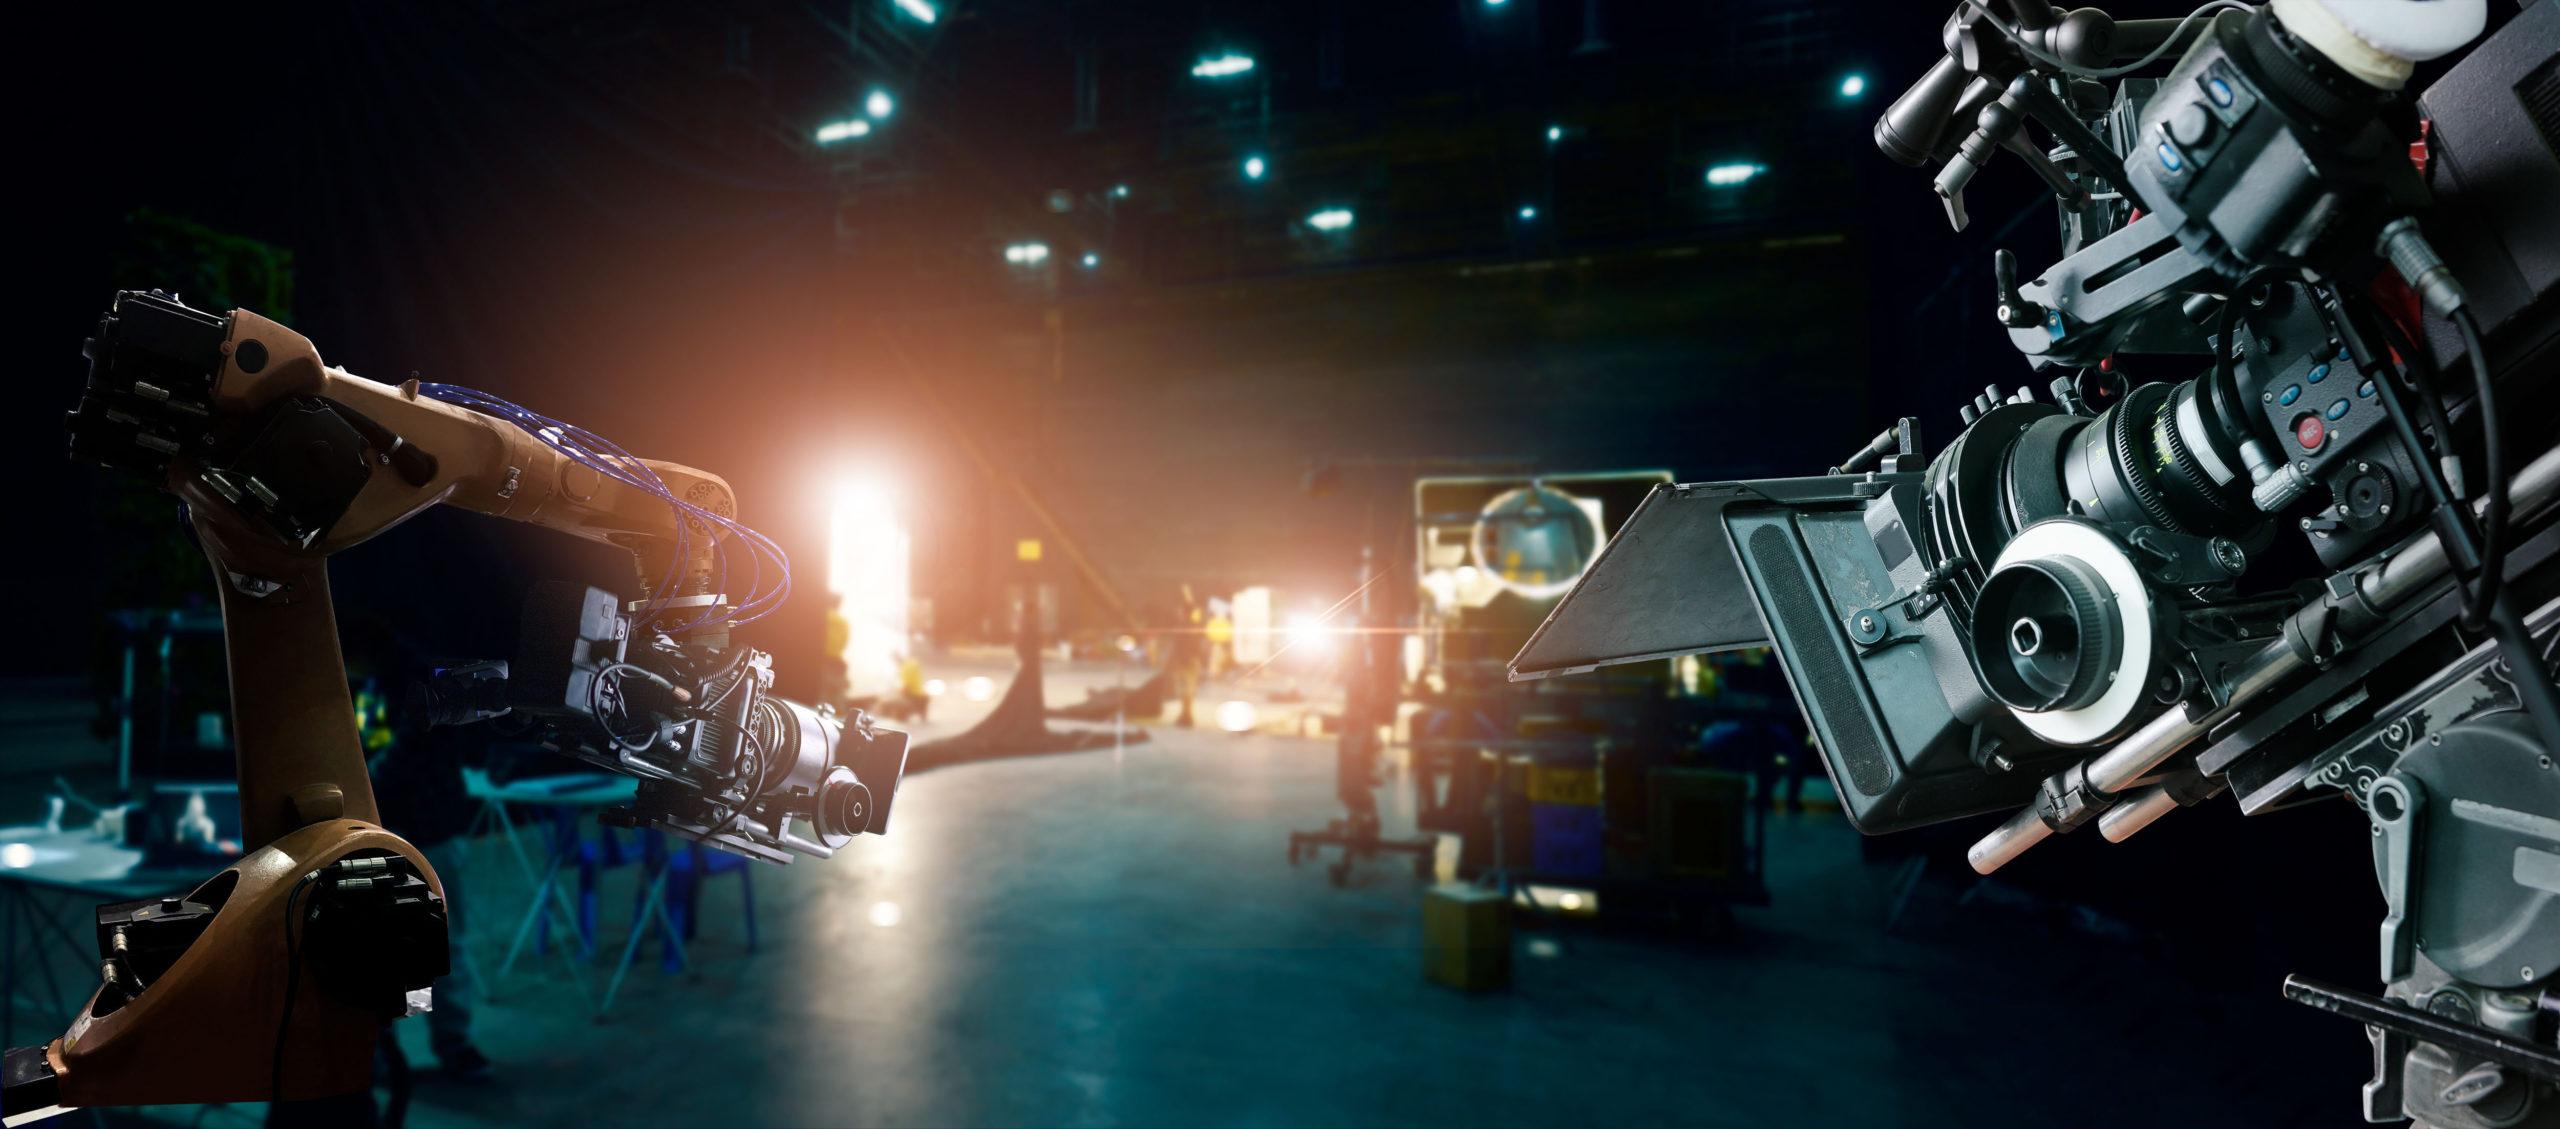 Film Studio With Equipment